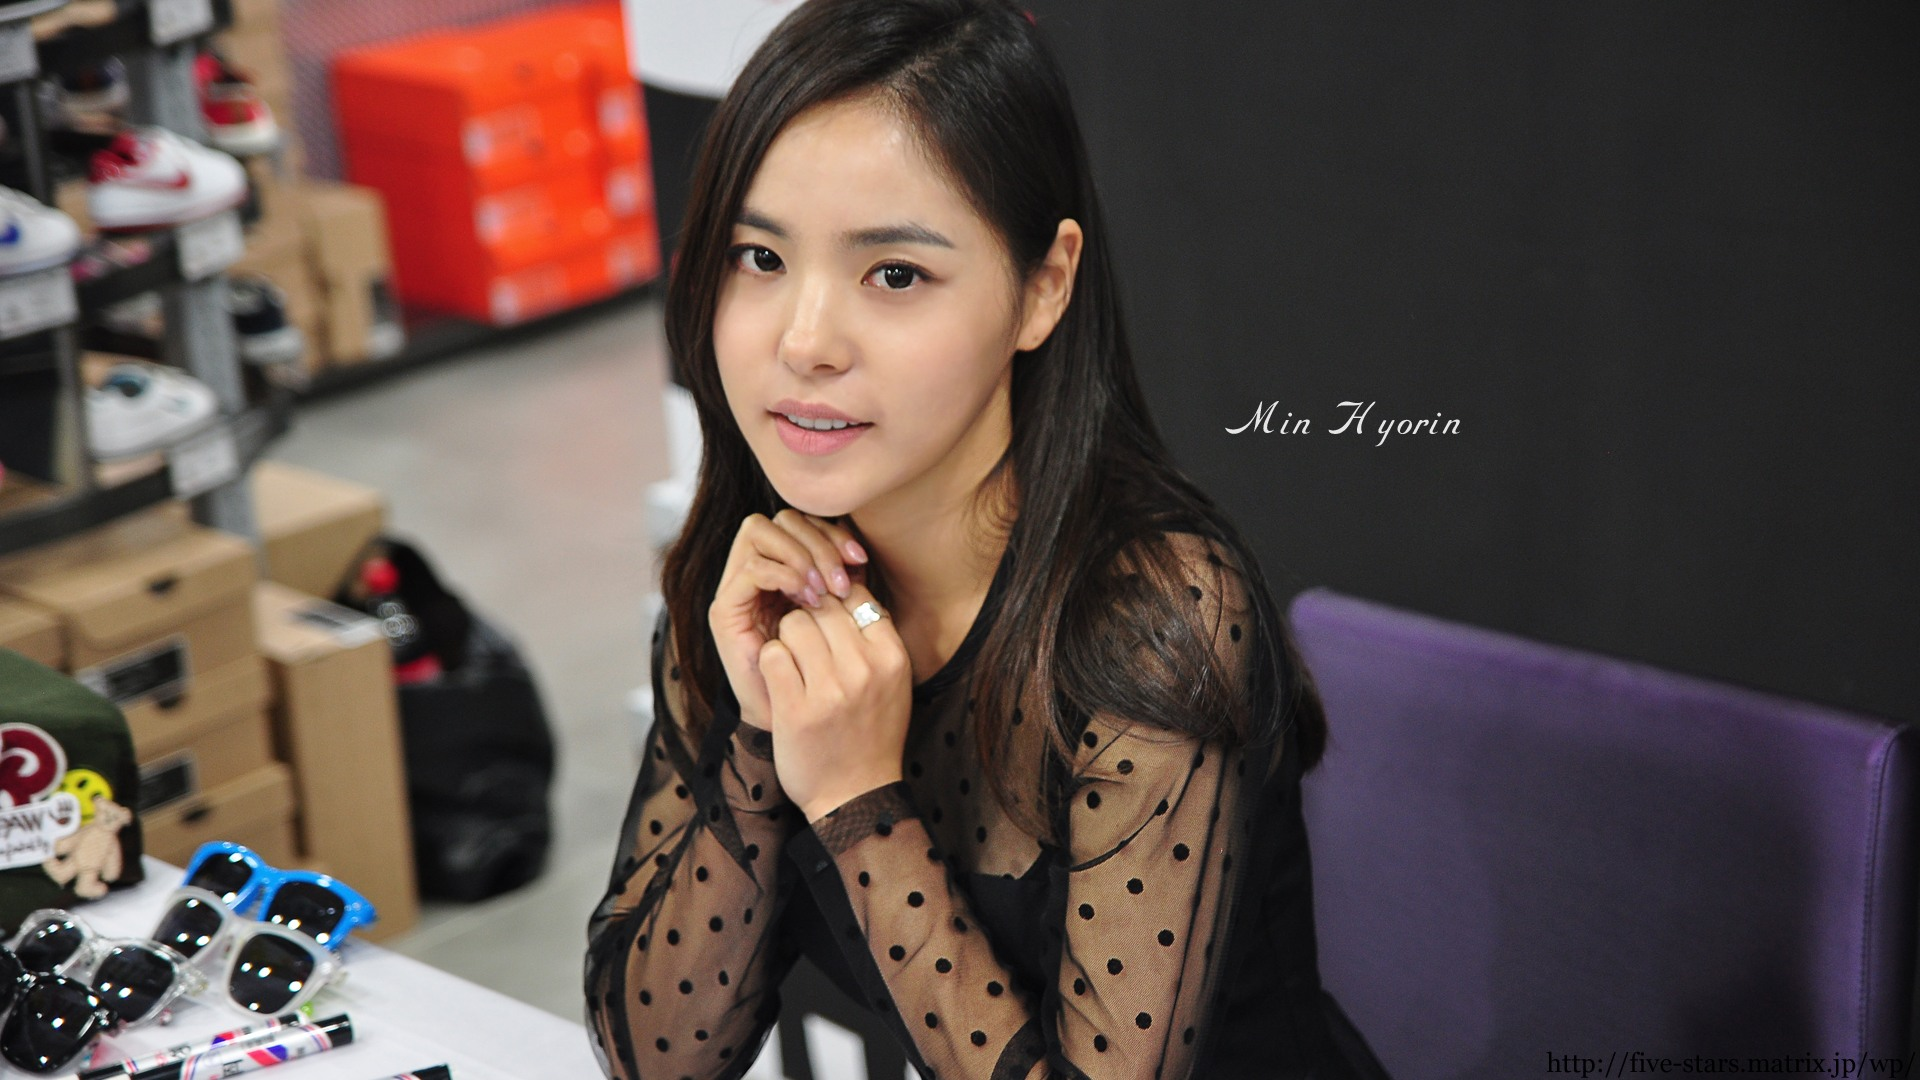 Min hyo rin dating